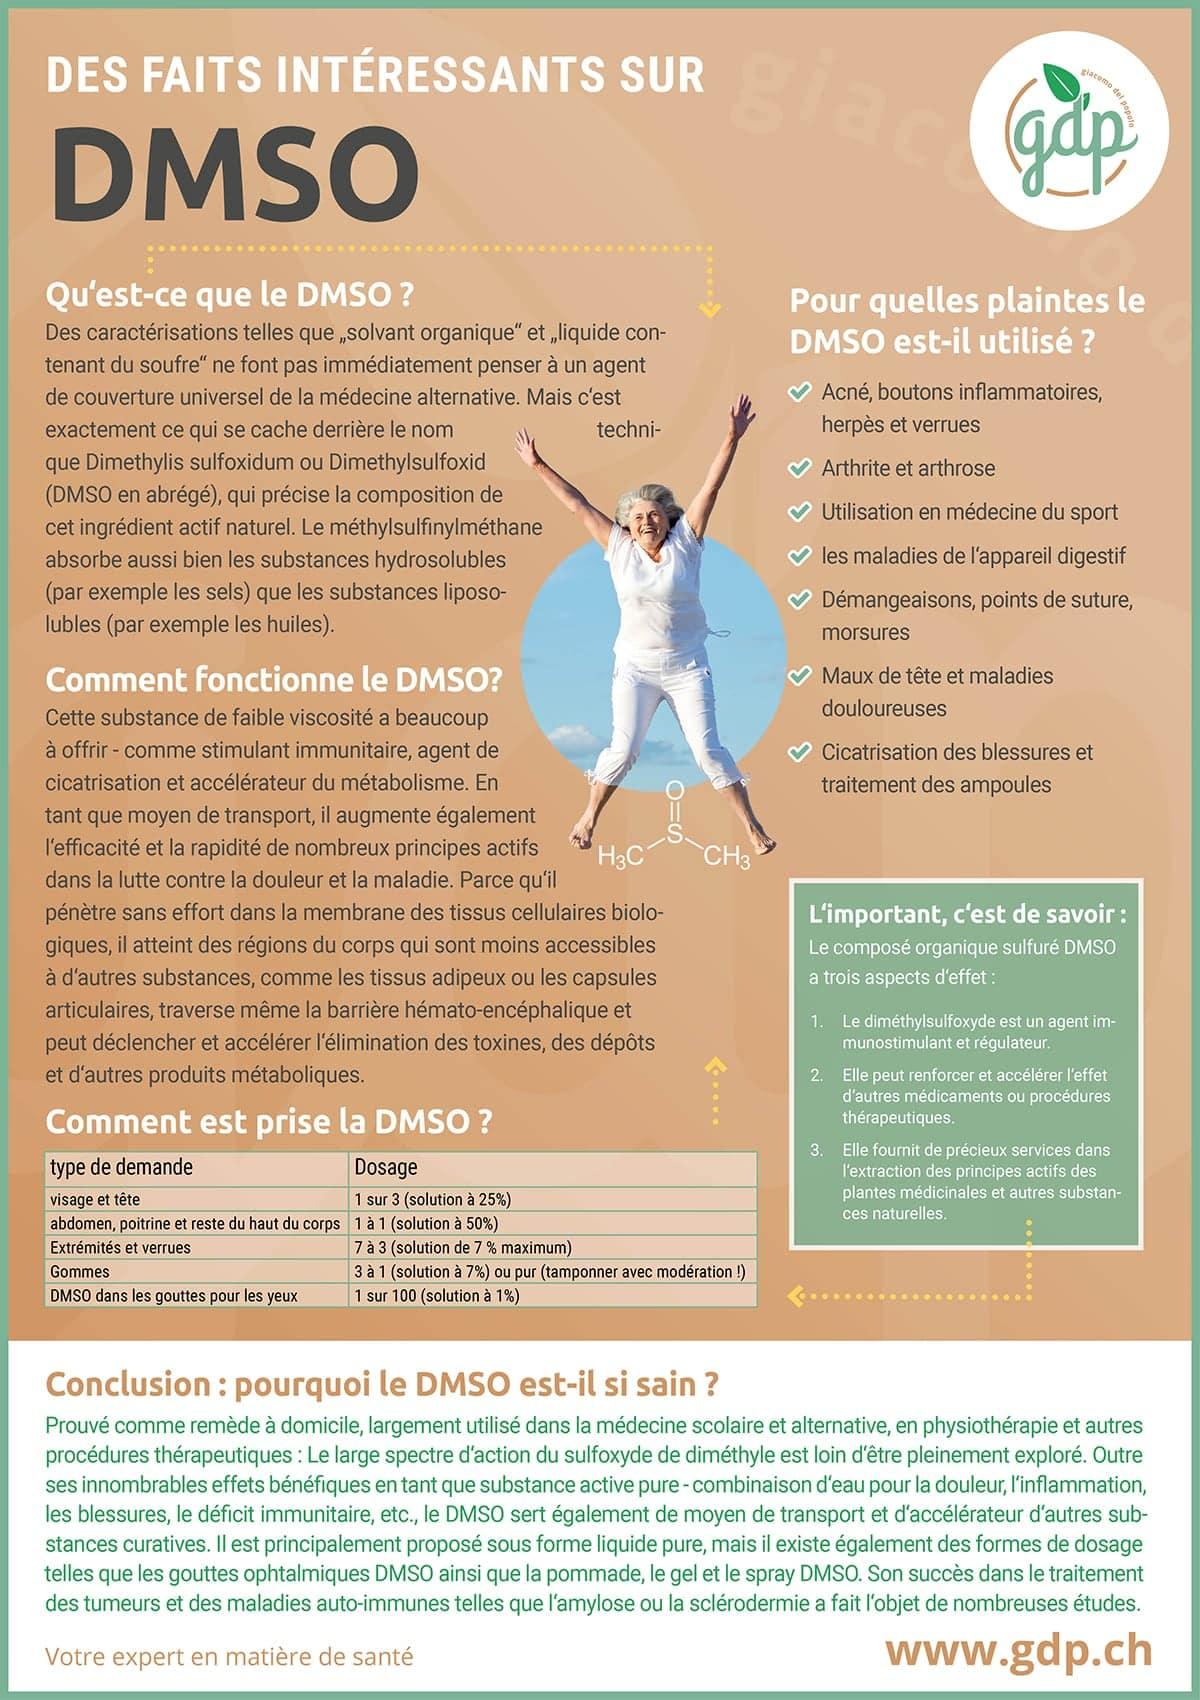 gdp Graphique d'information DMSO